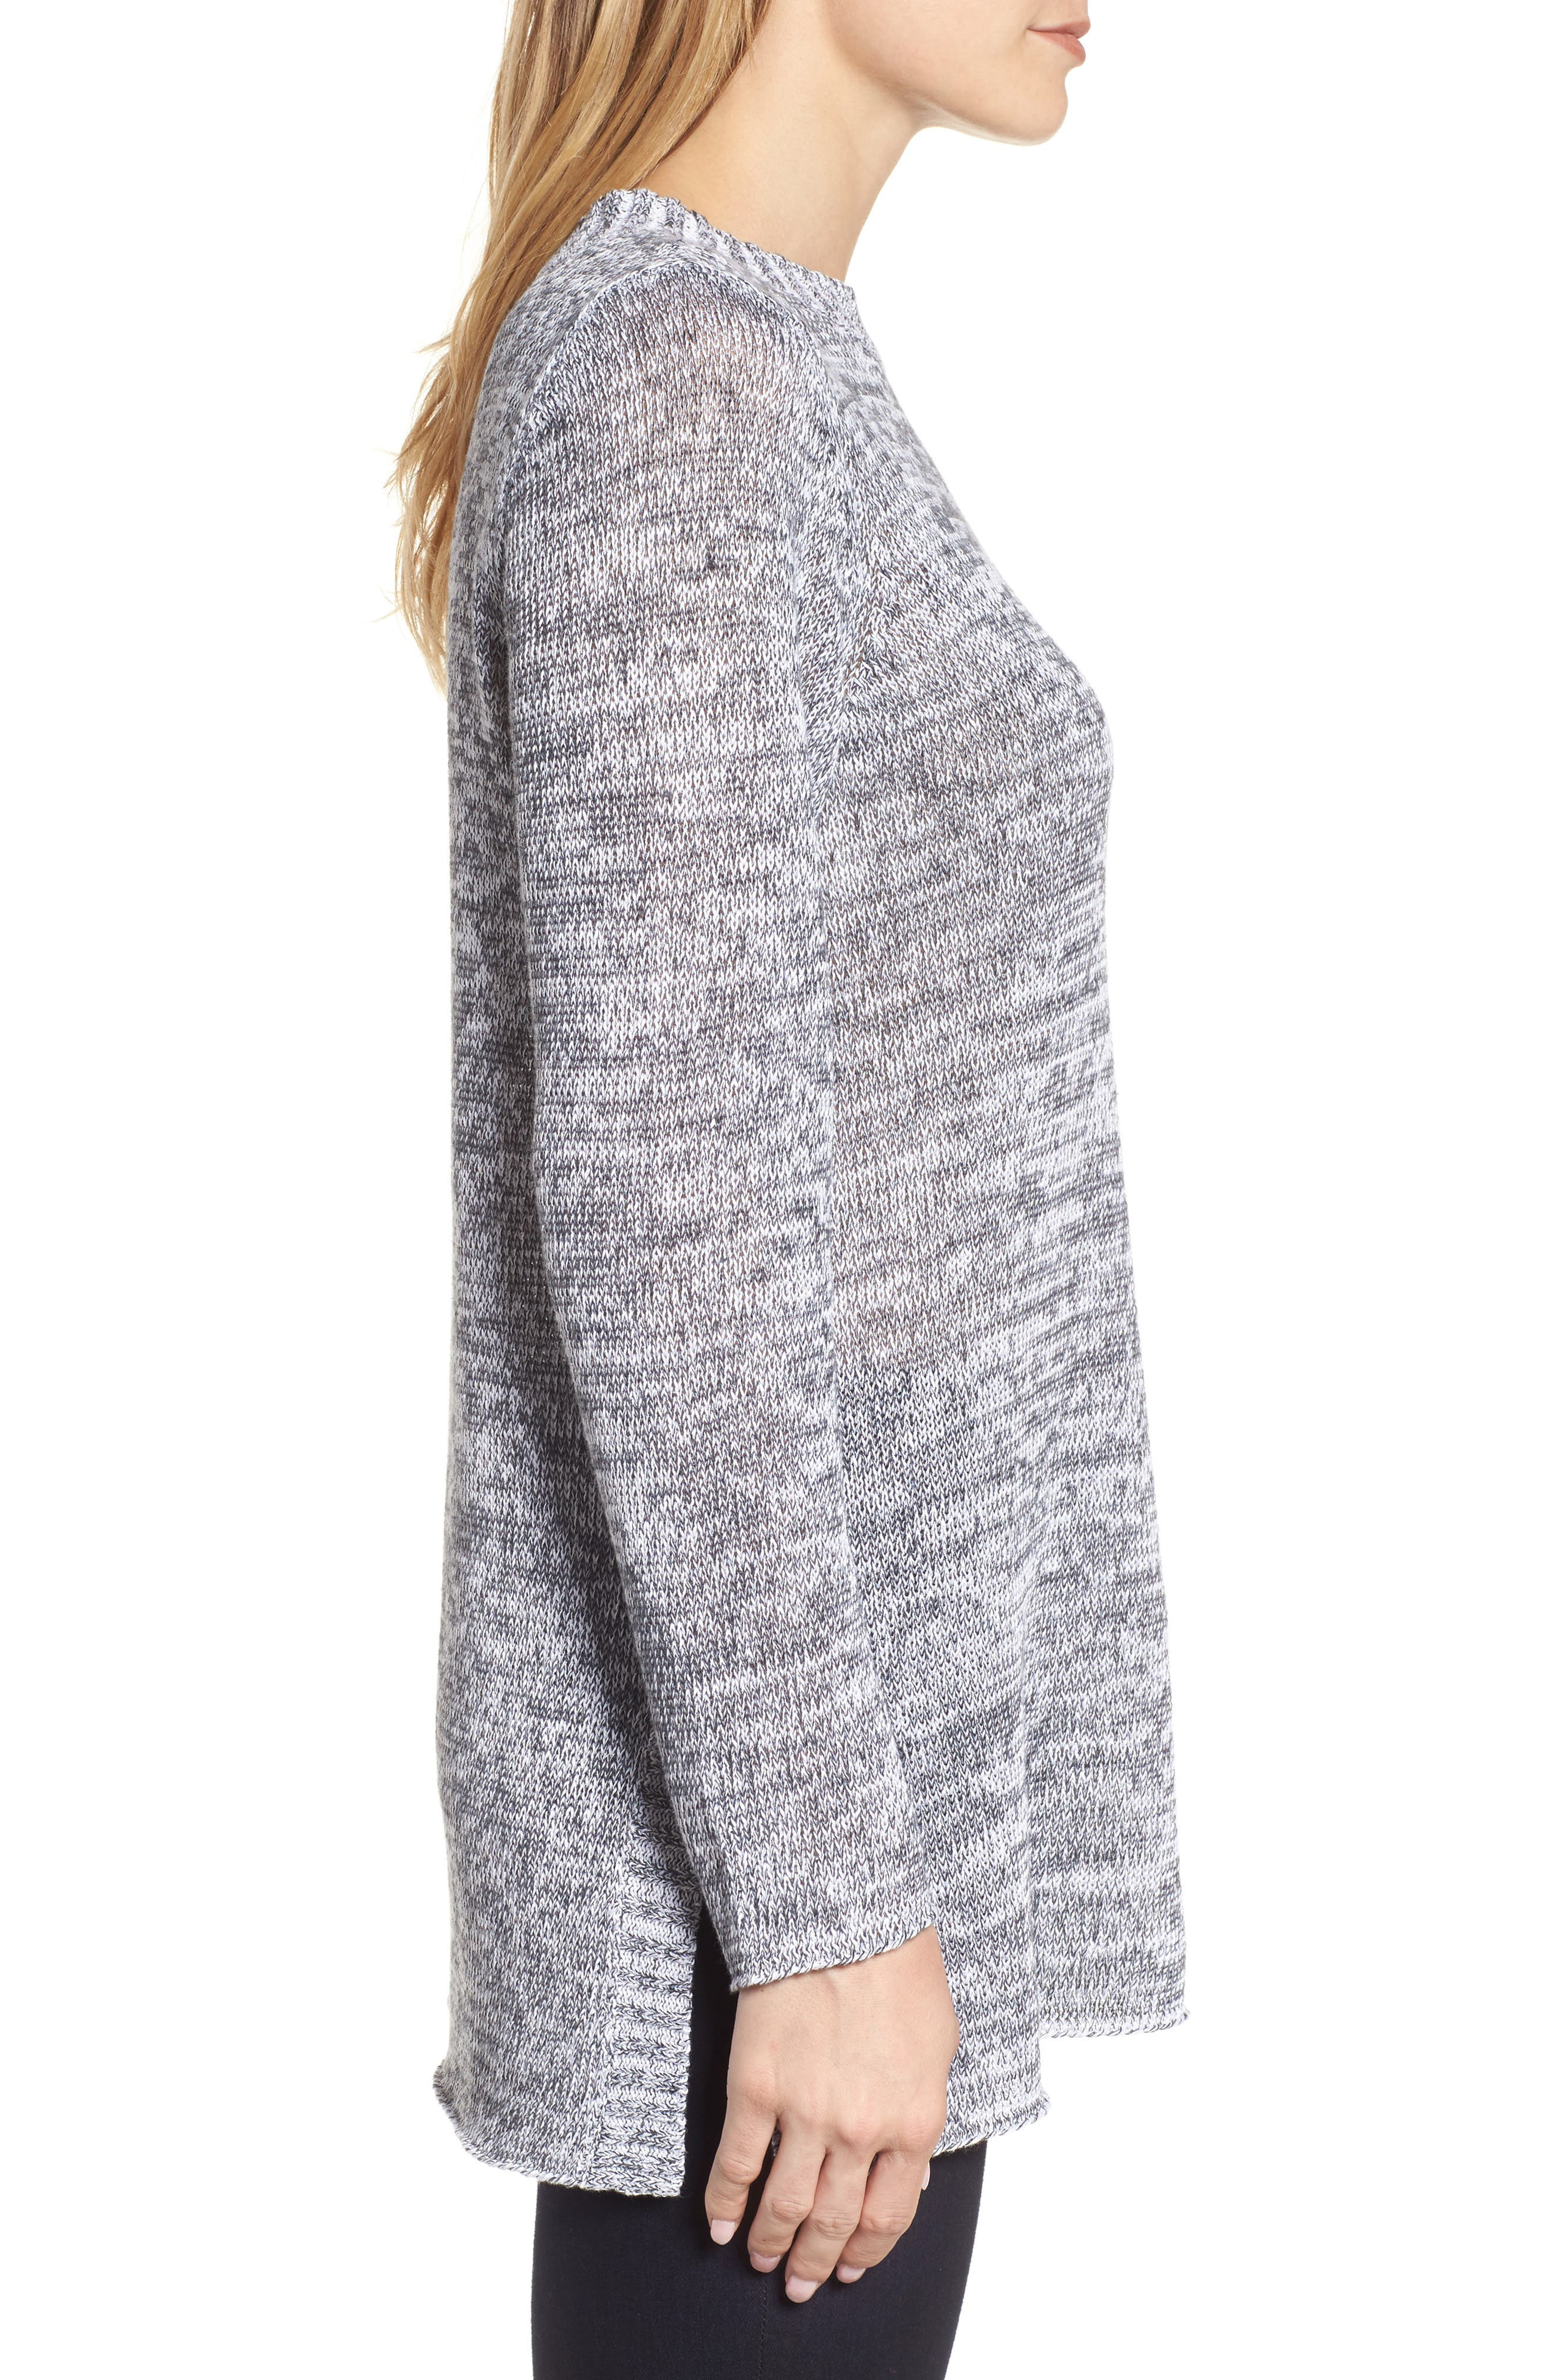 Organic Linen Crewneck Sweater,                             Alternate thumbnail 3, color,